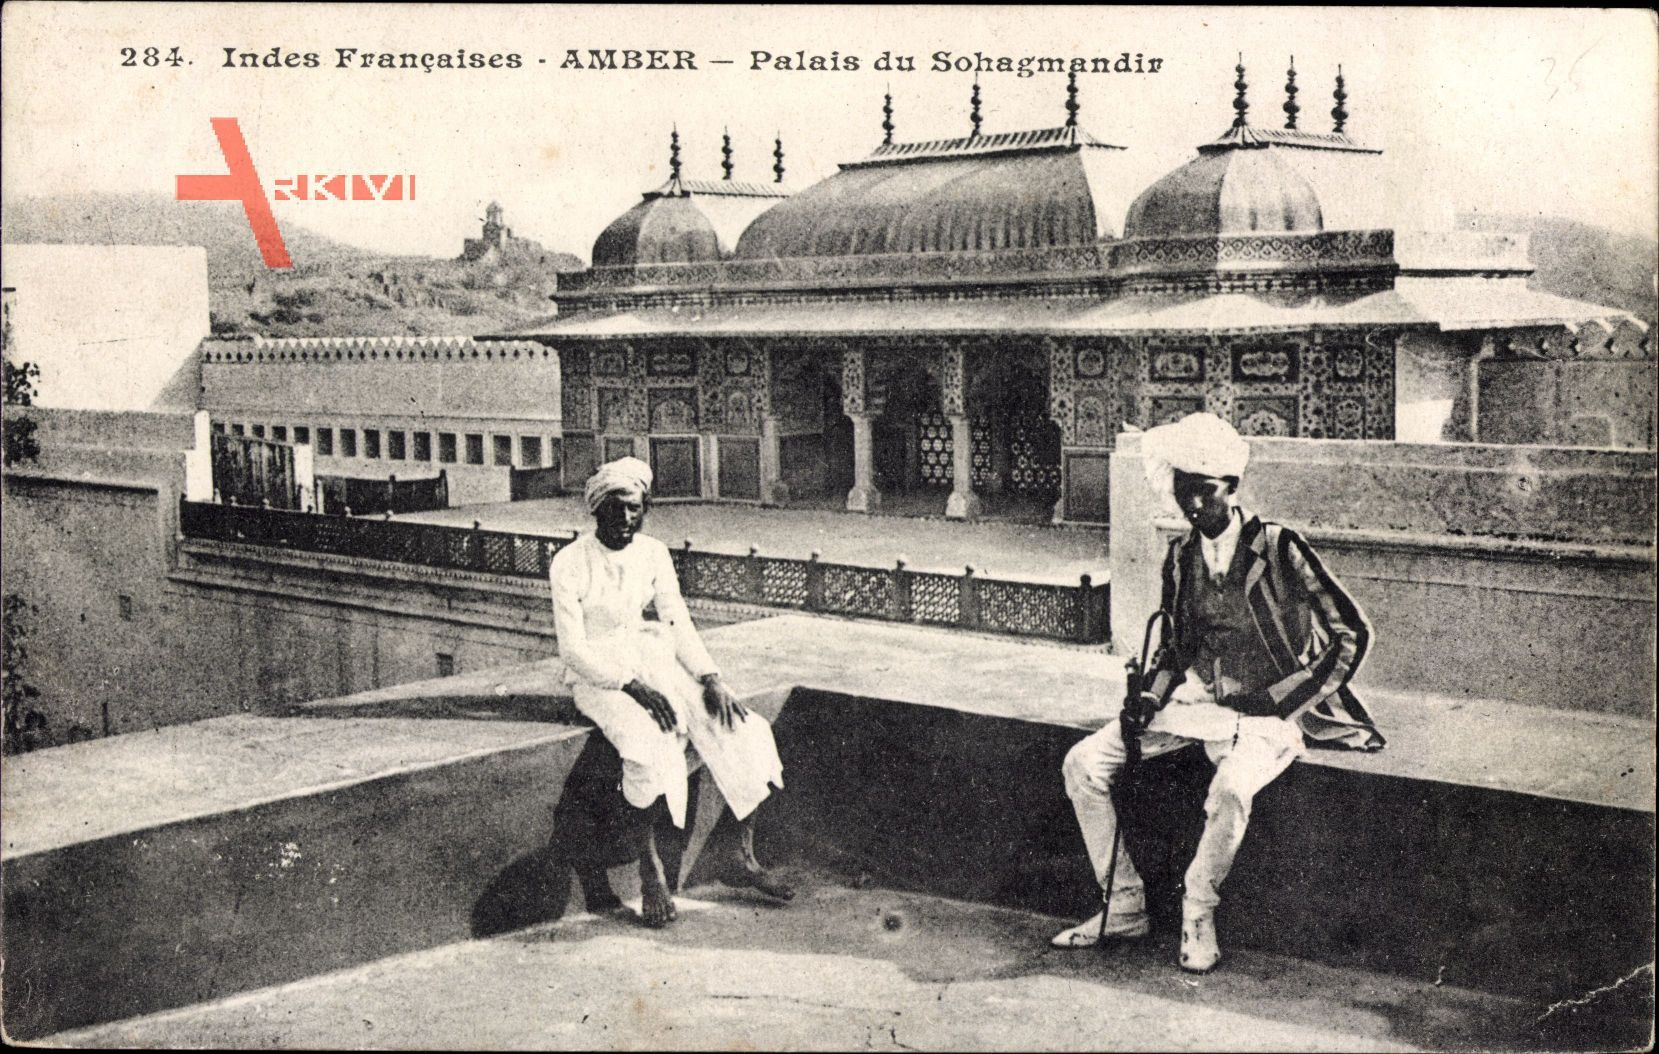 Amber Indien, Palais du Sohagmandir, Inder mit Gehstock, Palast